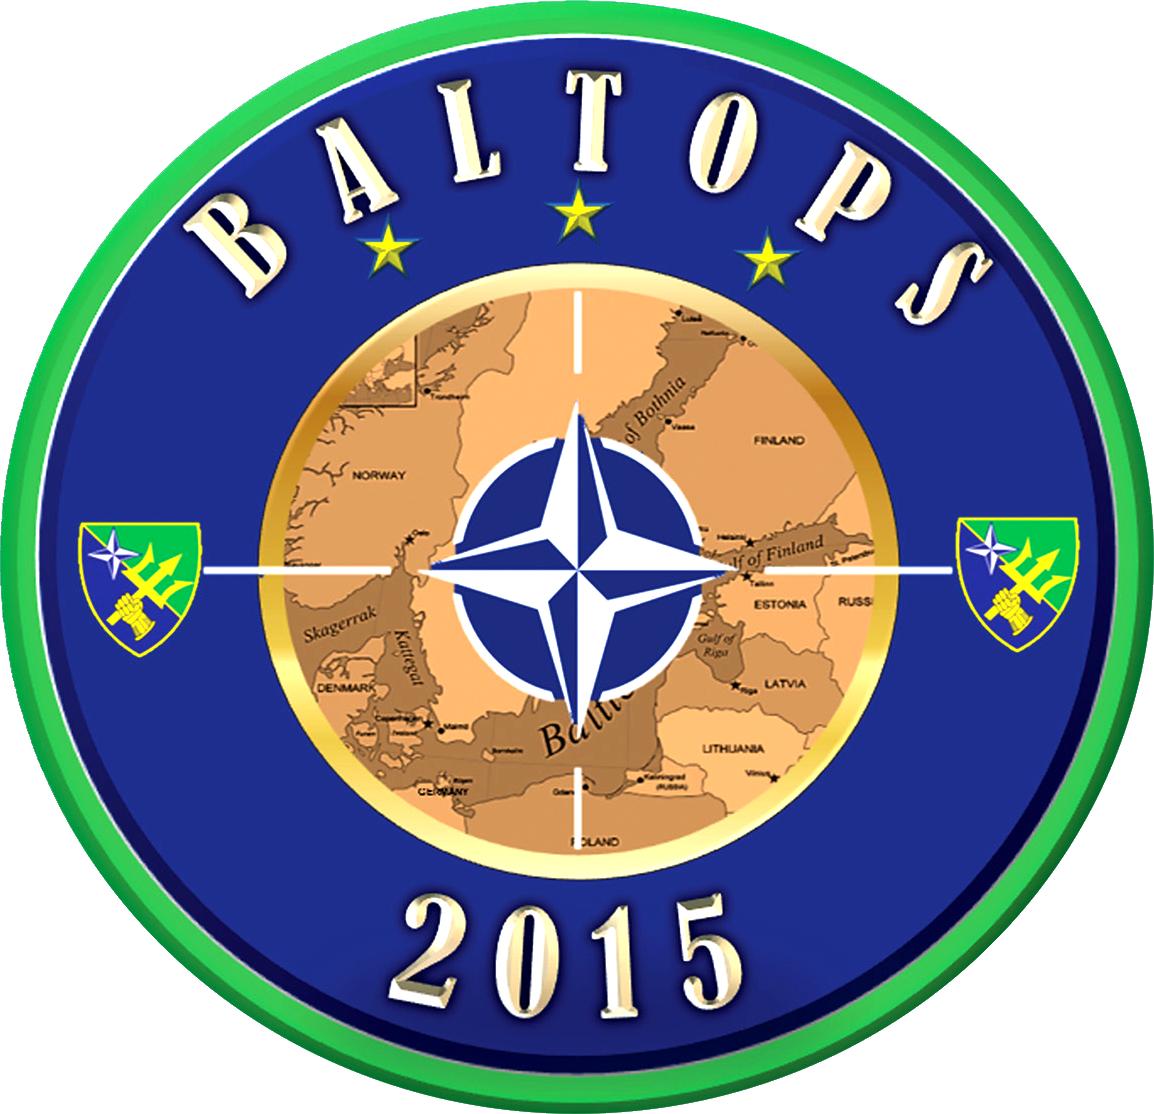 filenato baltops 2015 logopng wikimedia commons